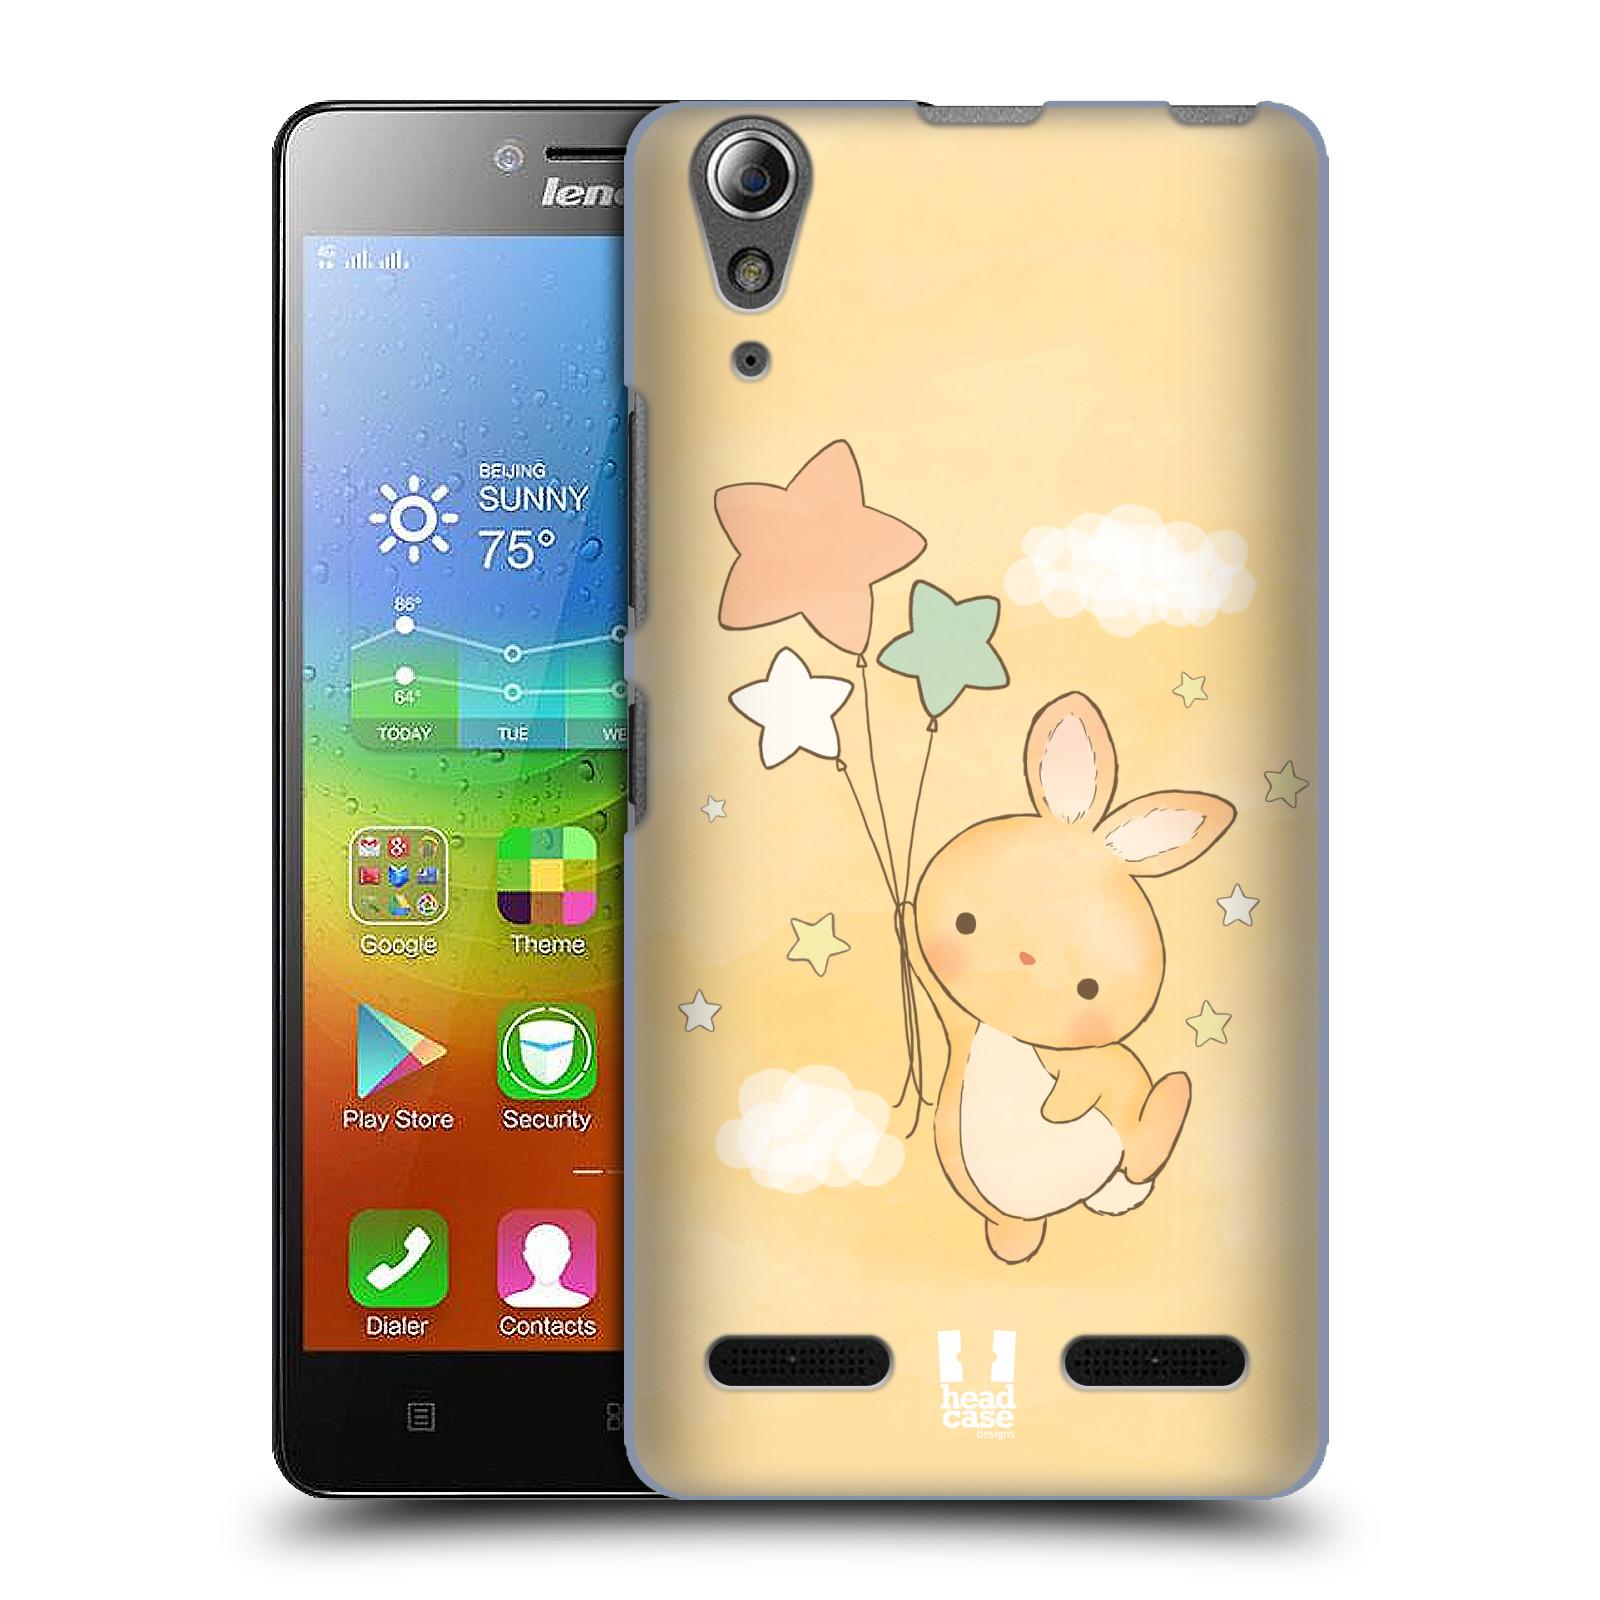 HEAD CASE pevný plastový obal na mobil LENOVO A6000 / A6000 PLUS vzor králíček a hvězdy žlutá